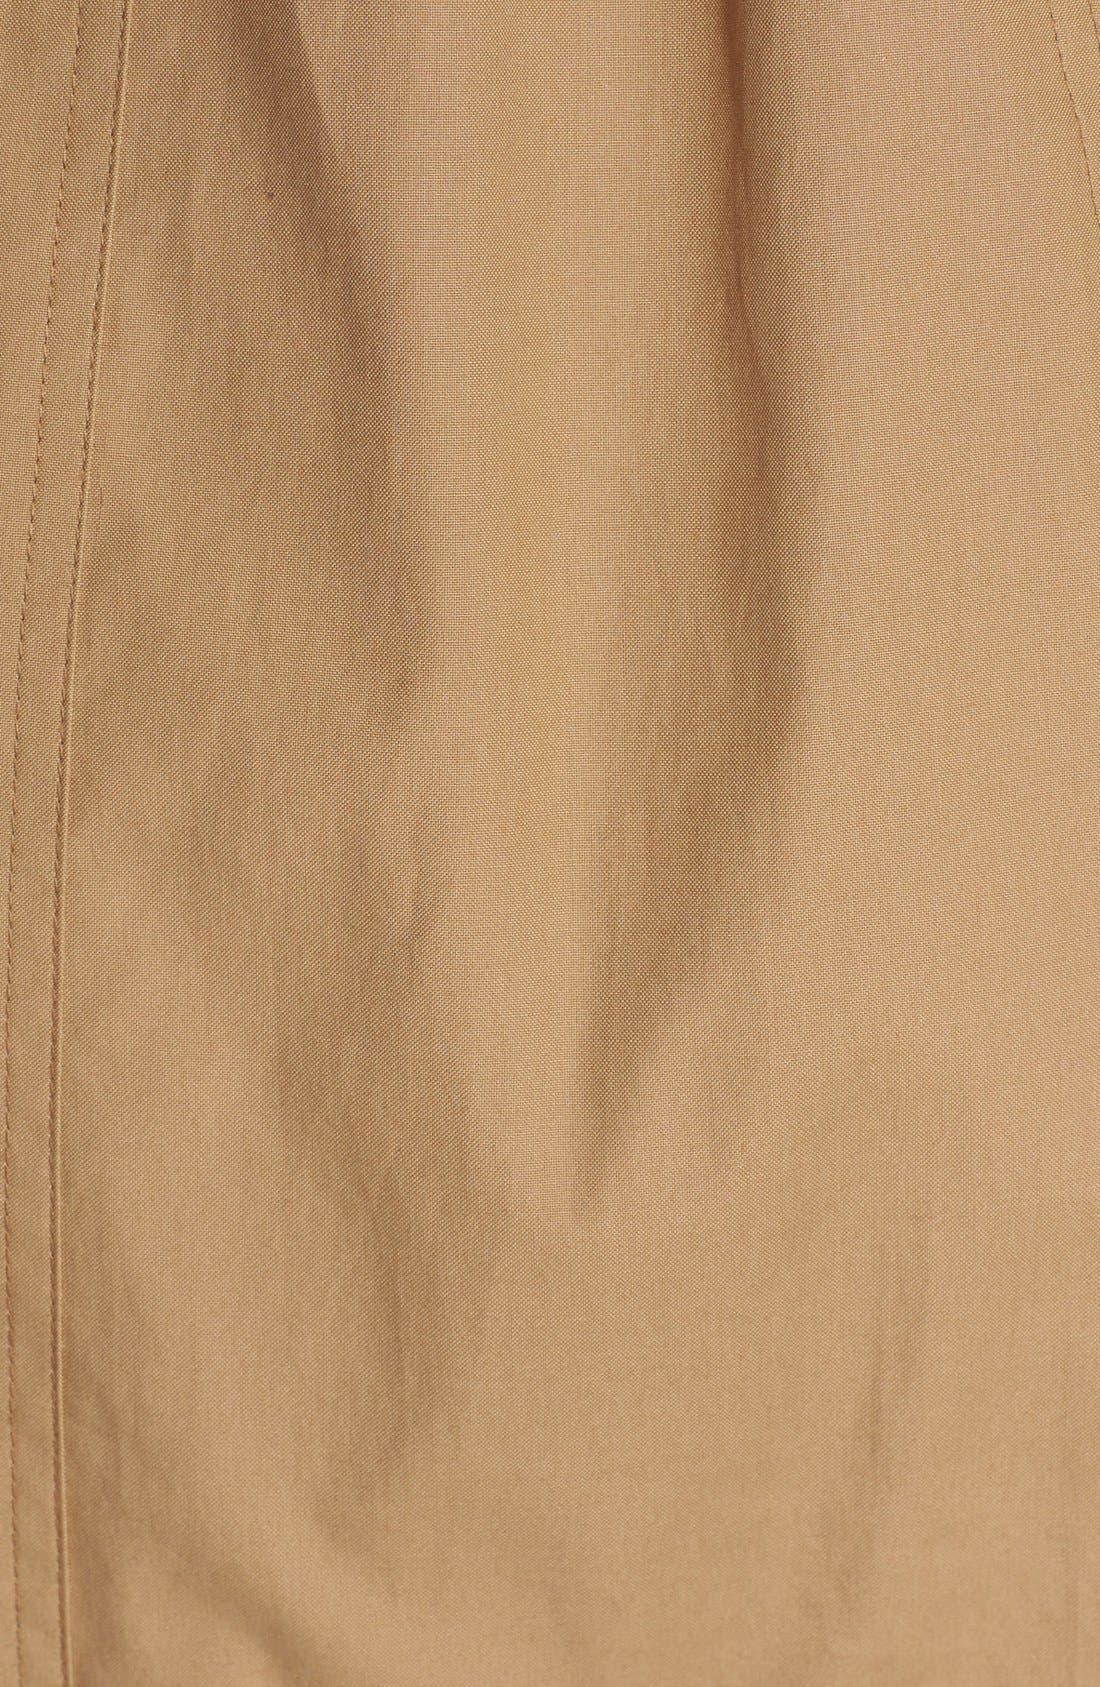 Alternate Image 3  - Burberry Brit 'Fenstone' Single Breasted Trench Coat